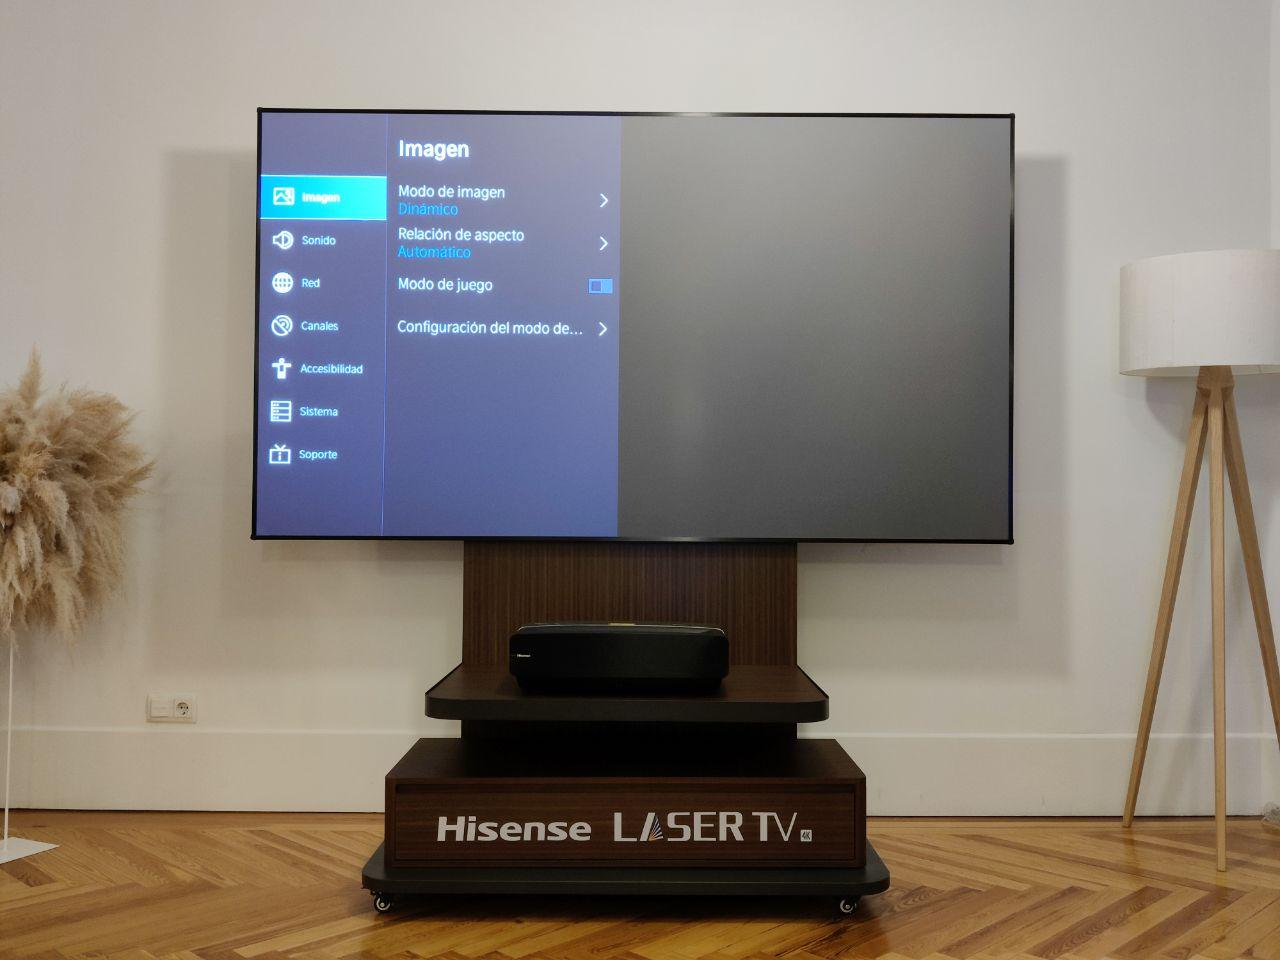 Hisense Laser TV 100L5F-A12